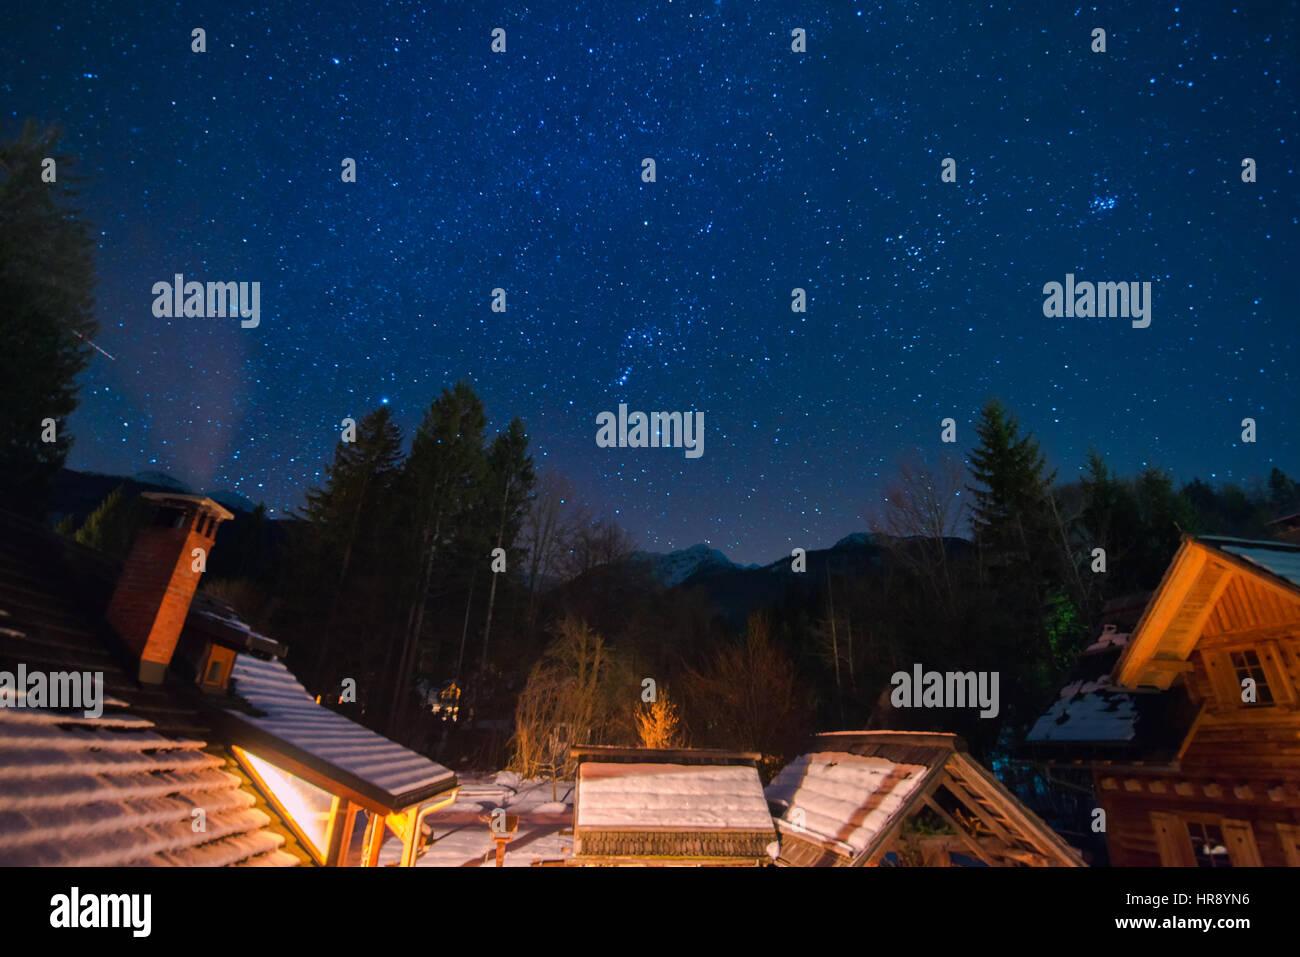 Night sky and stars above mountain cabins in winter, idyllic midnight scene - Stock Image